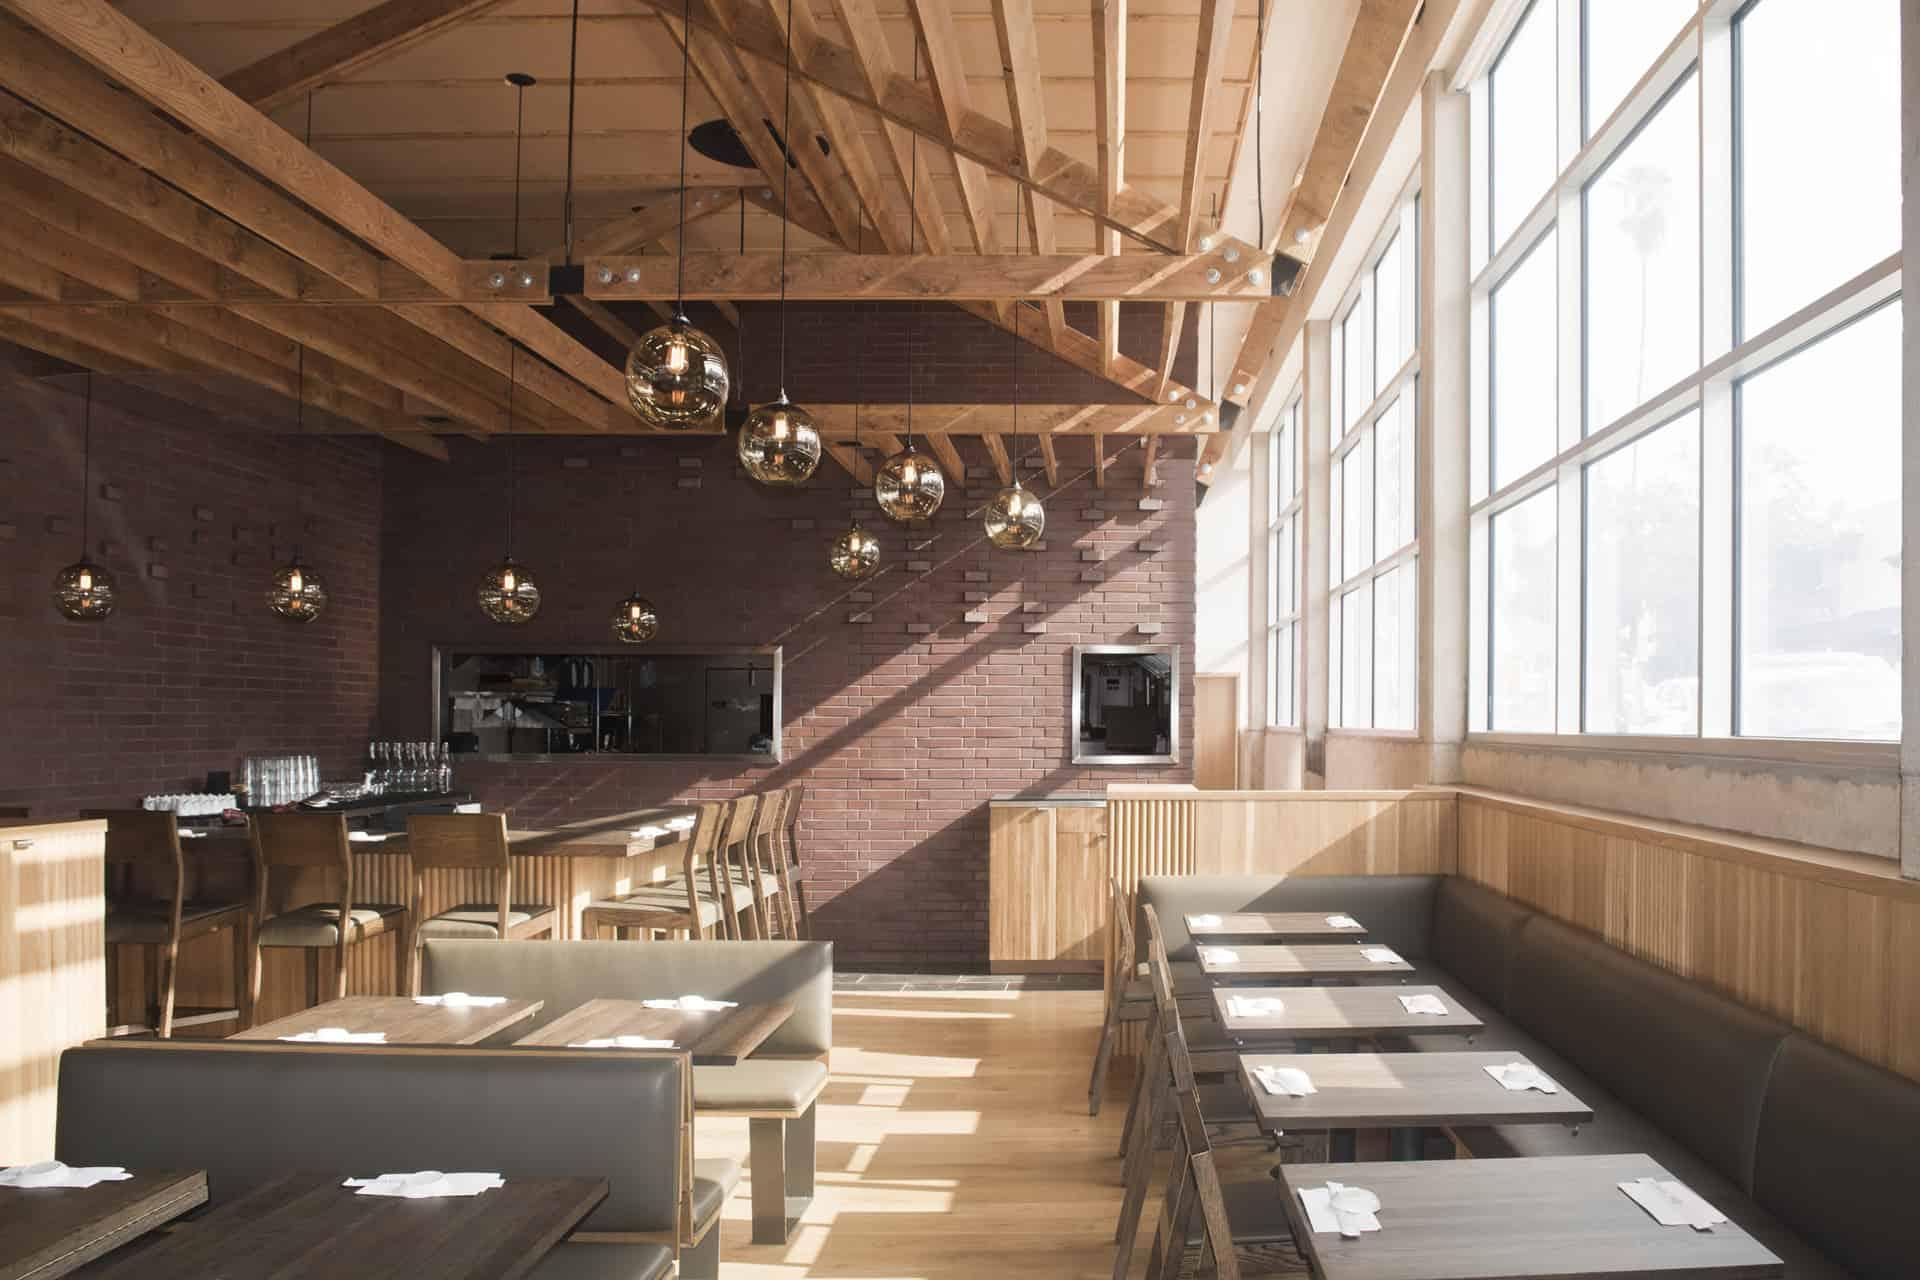 Lampadari per travi in legno. cheap soffitto e di legno per travi a